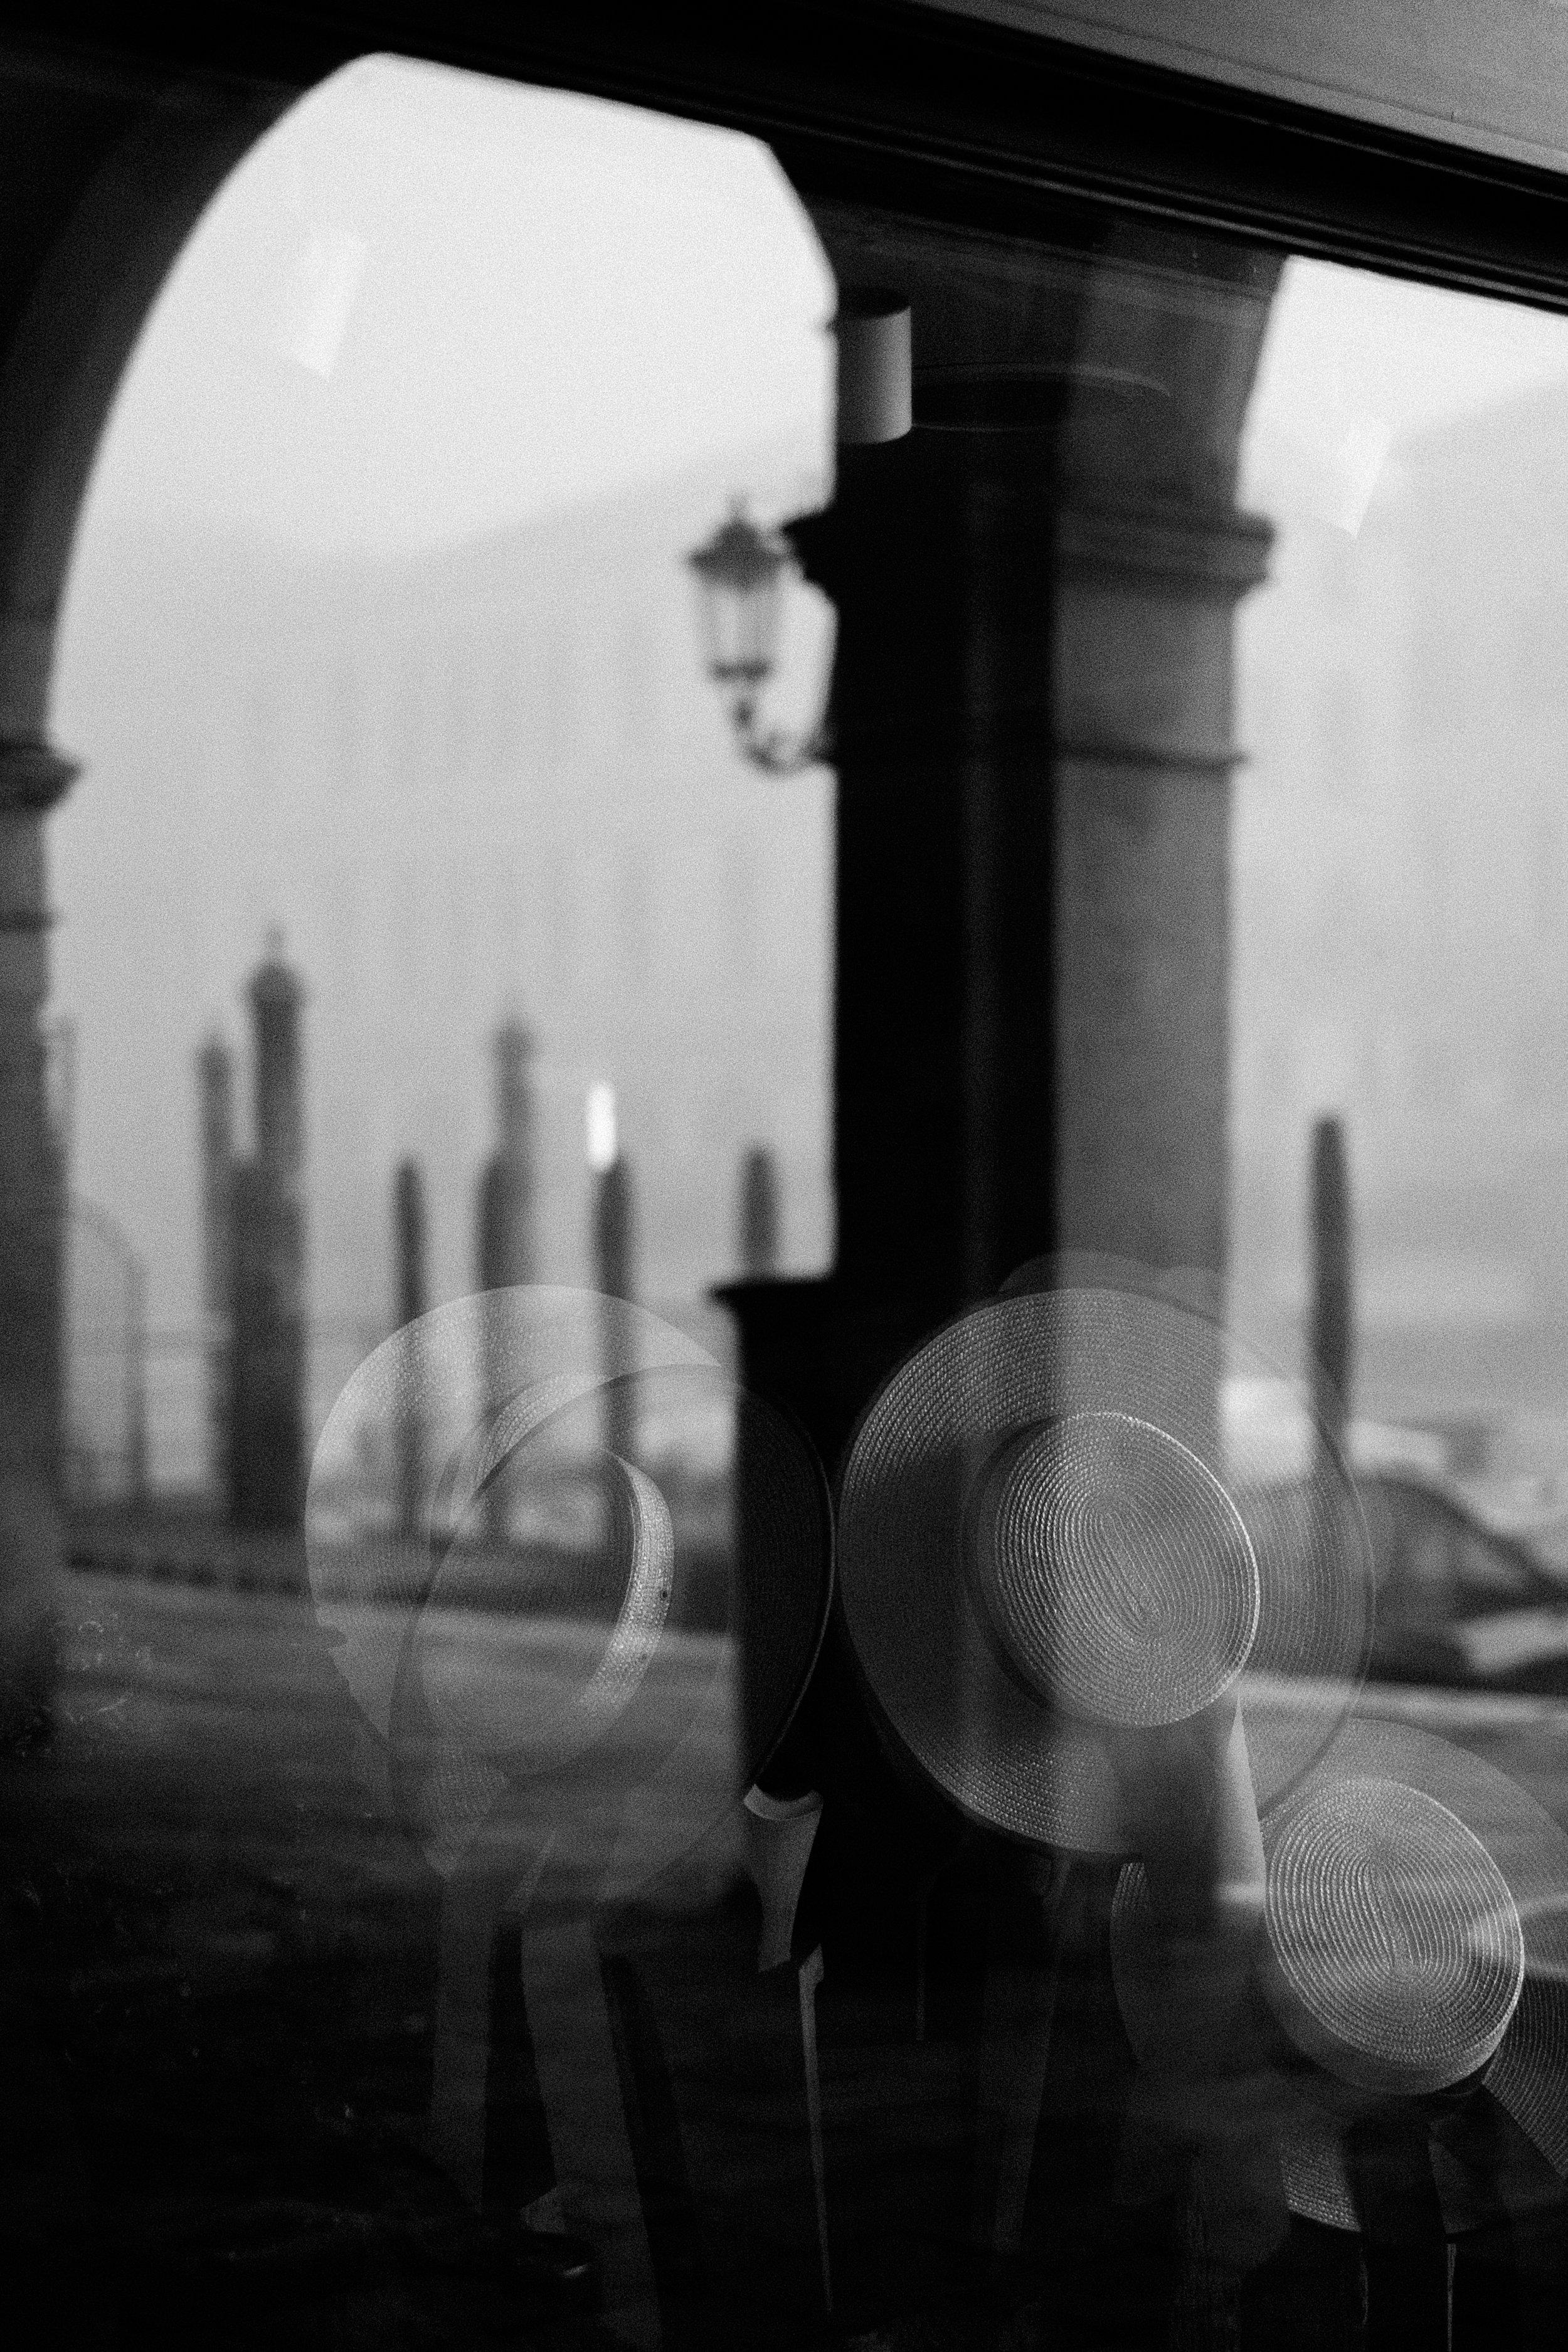 Photo: Alvise Busetto • FUJIFILM X-T10 • 35mm Ƒ/1.4 @ Ƒ/1.4 • 1/500 • ISO 2500